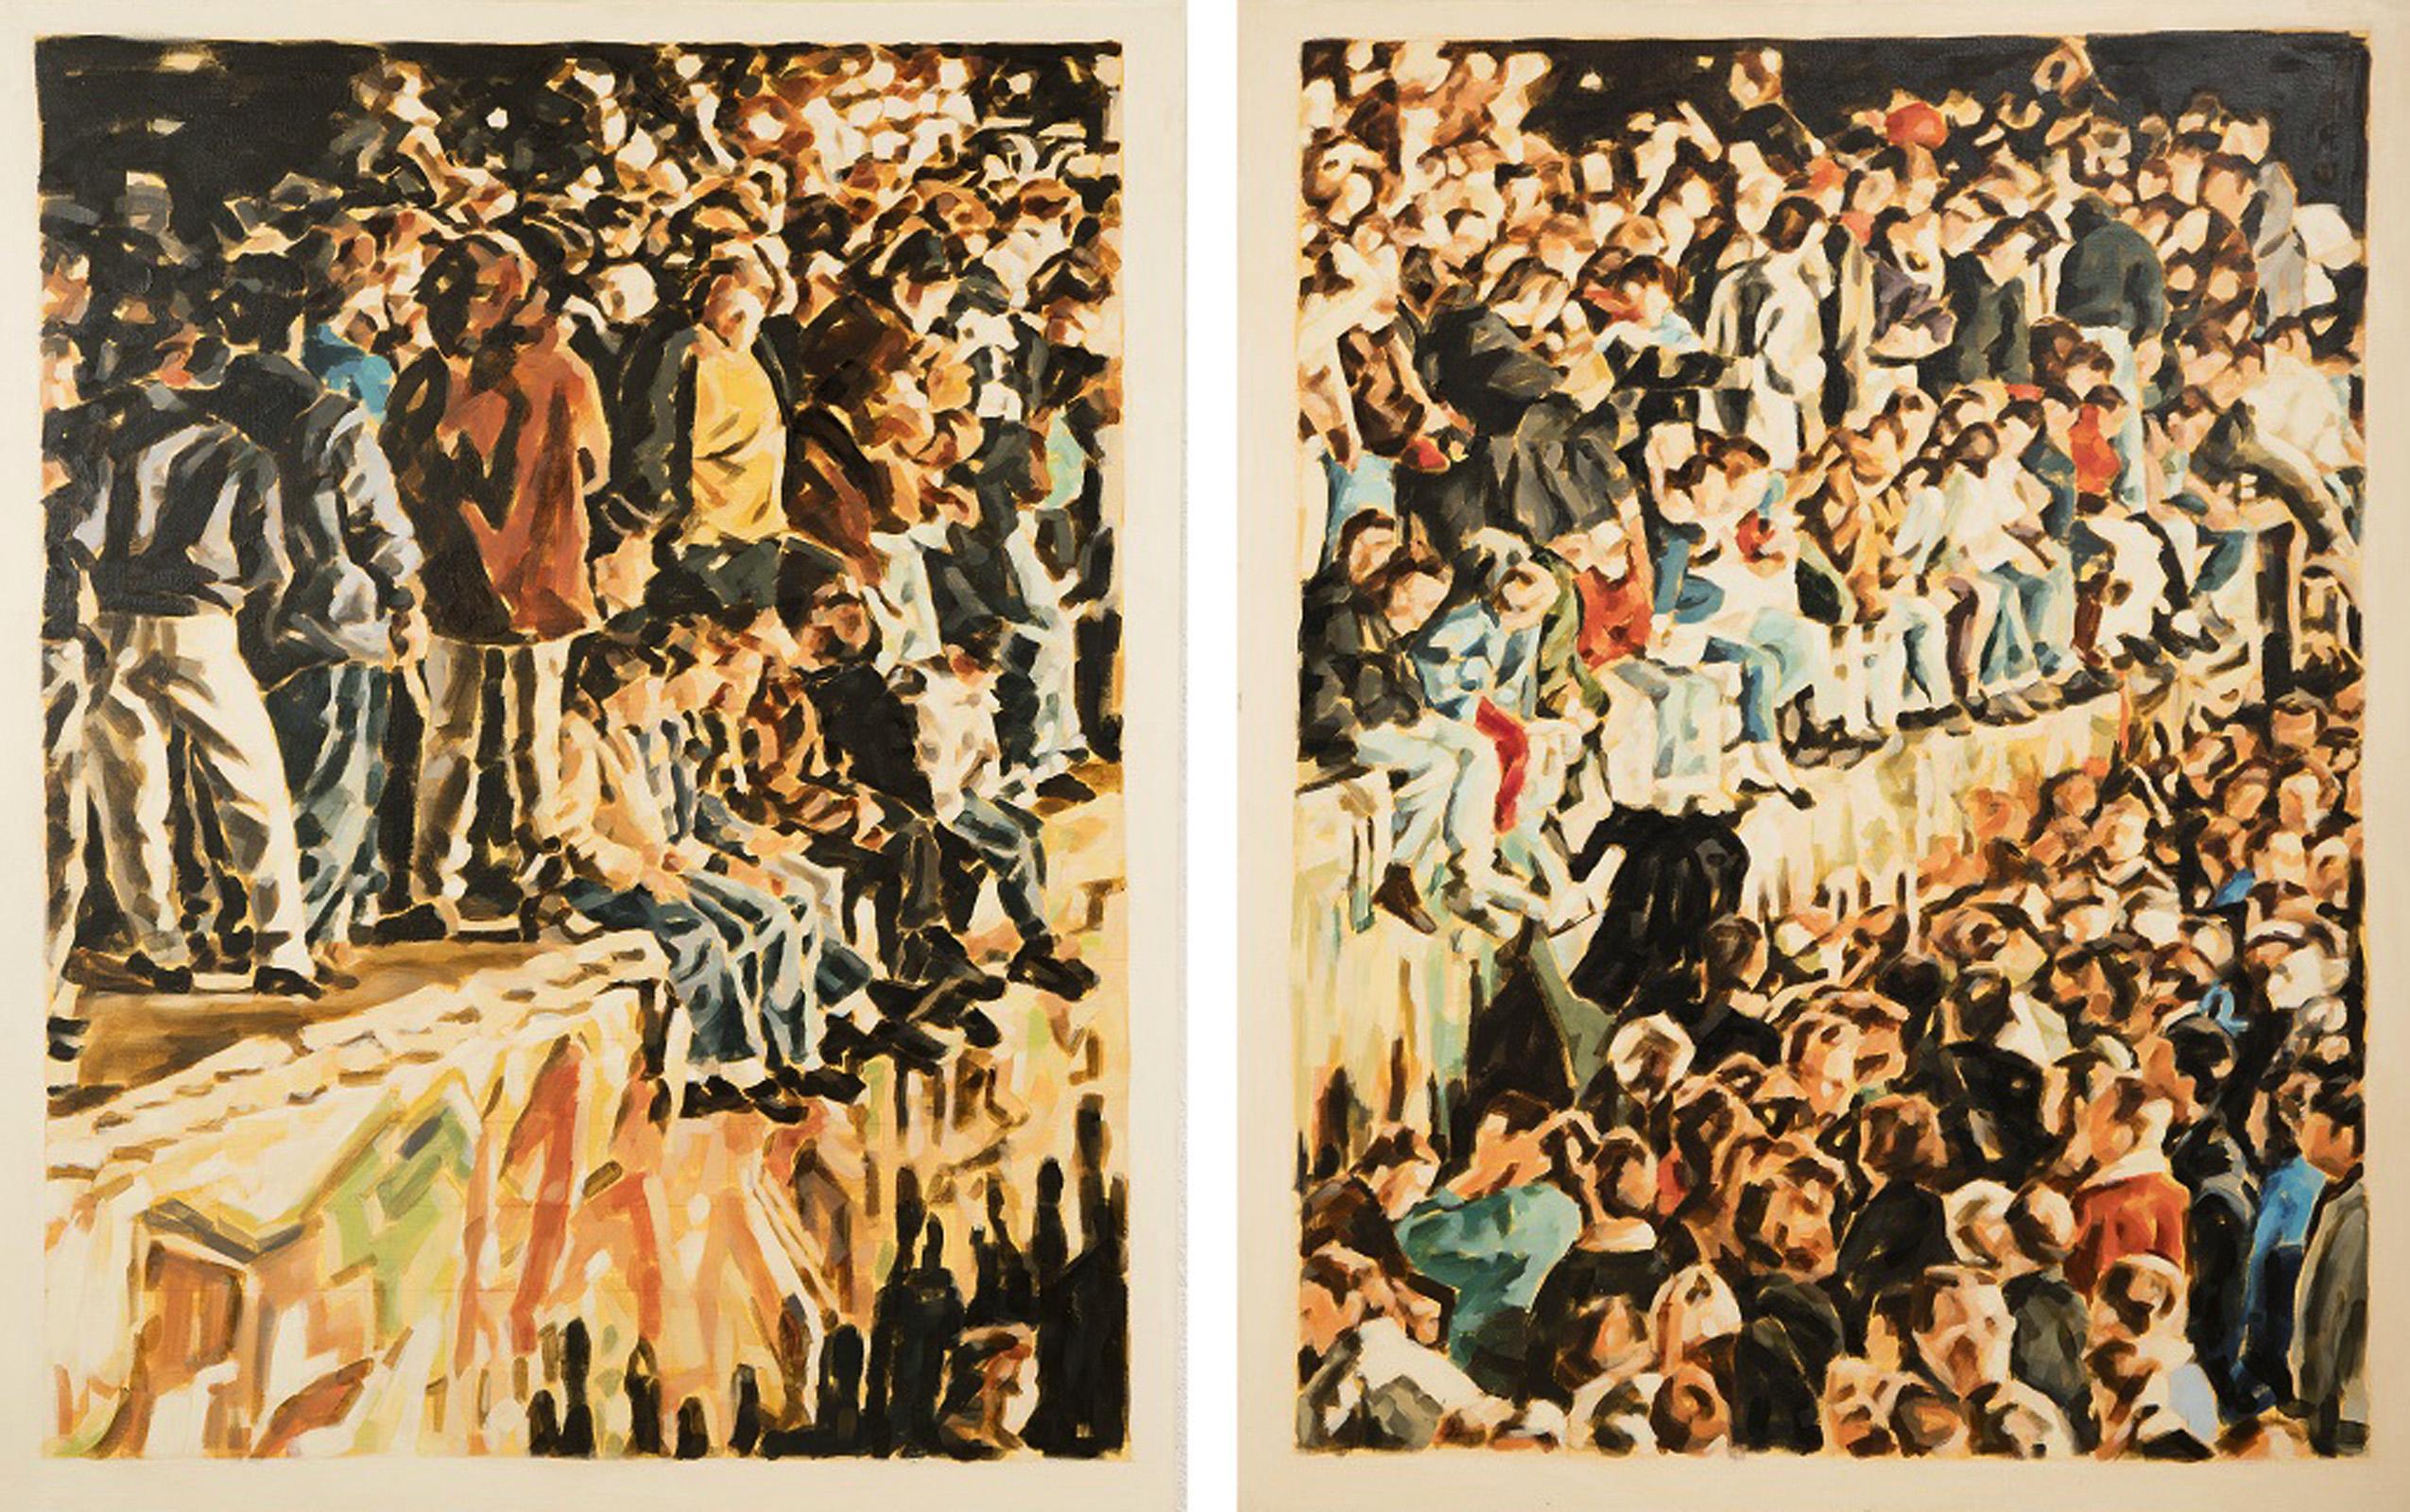 """9. November 1989"",  Diptychon, 2x 110 x 85 cm, Öl auf Leinwand, Diptychon, 2015 / 2016"